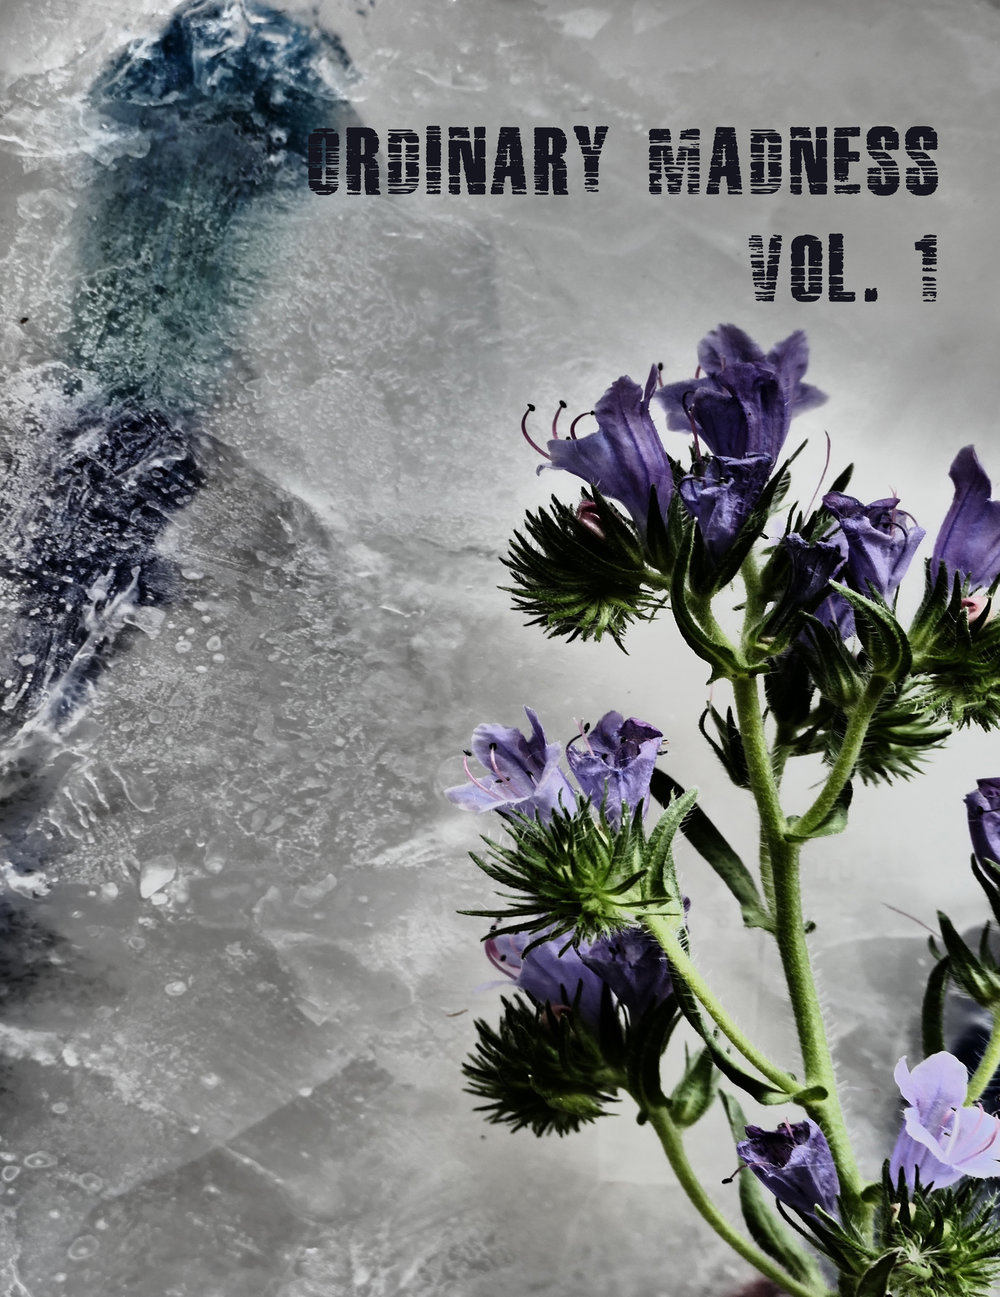 Ordinary Madness    Vol. 1